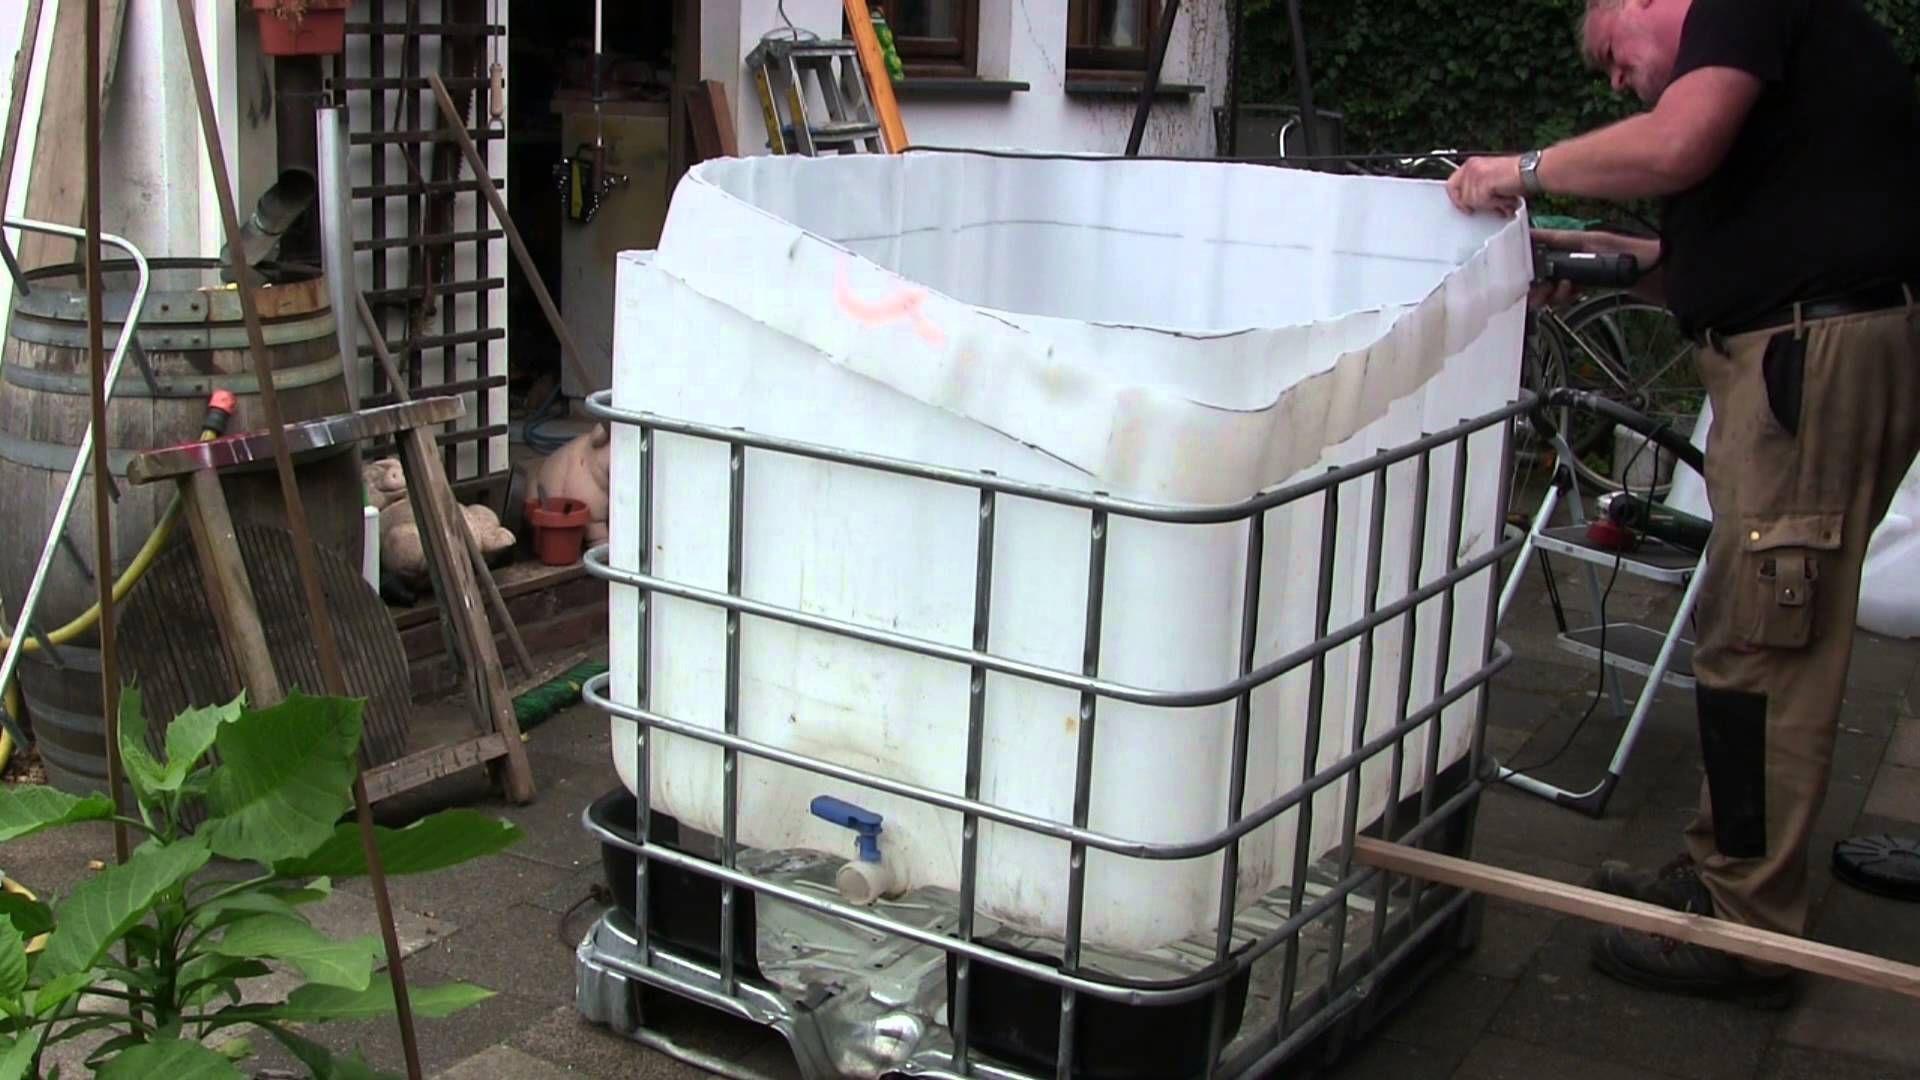 Video Pool aus IBC Tank Container selber bauen  So